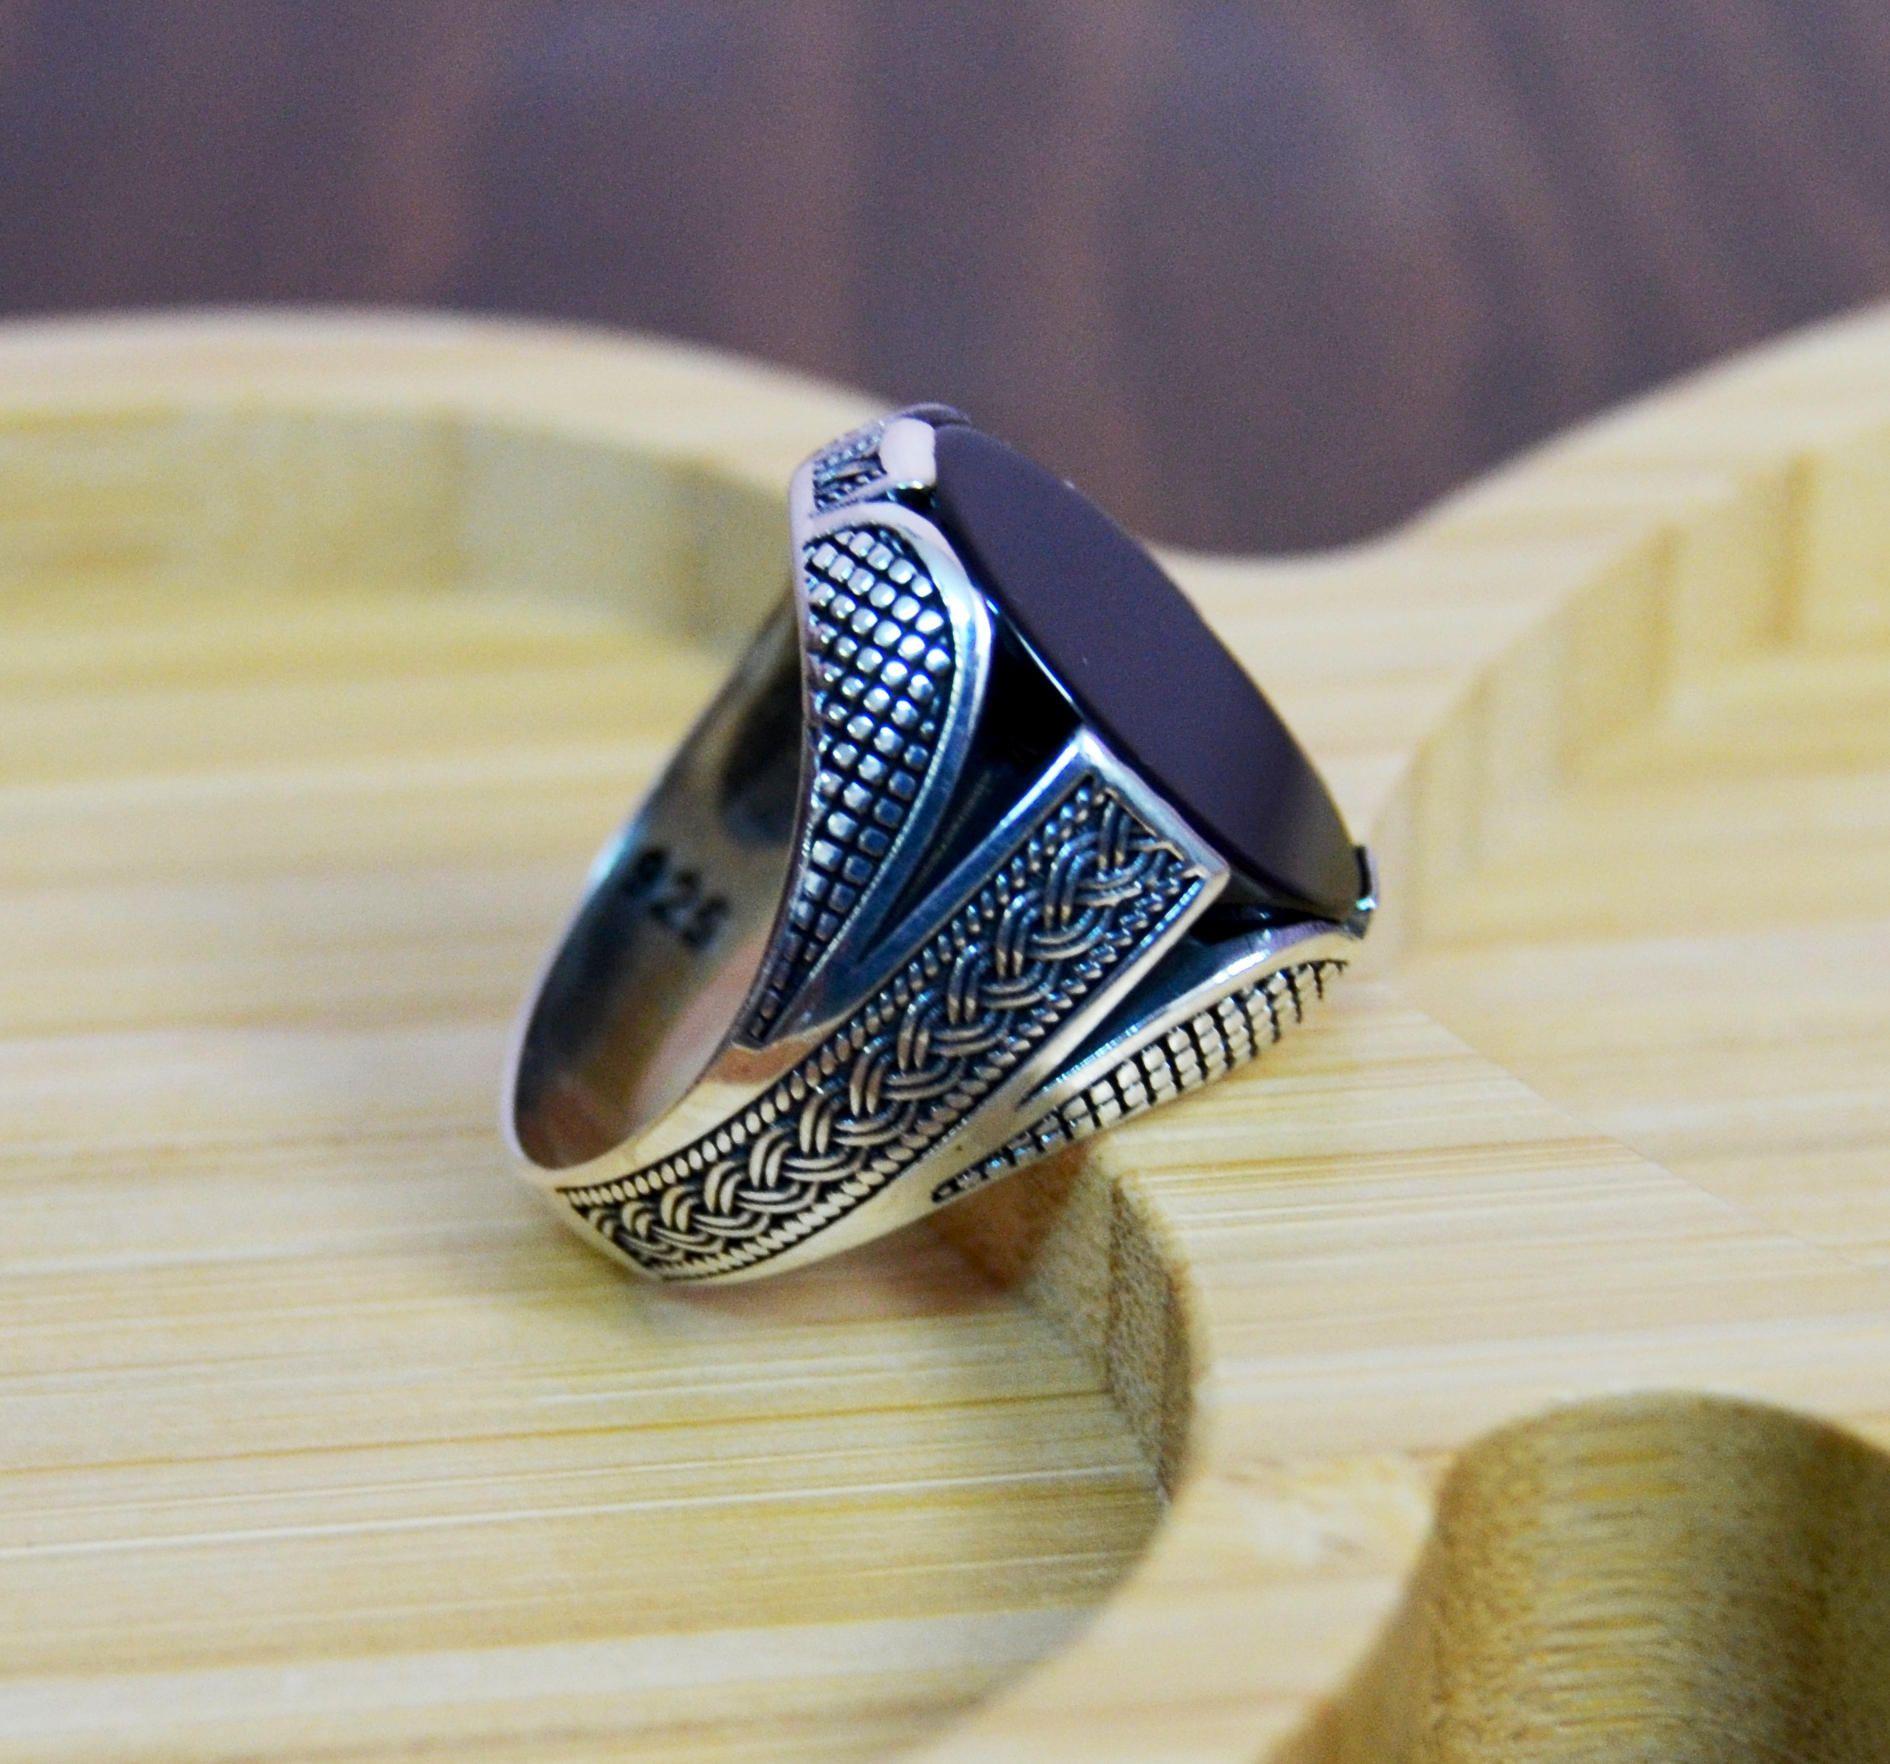 Men/'s Ring Gift for Him Silver Men/'s Ring Men/'s Jewelry Onyx Ring Turkish Handmade Ring 925k Sterling Silver Ring, Ottoman Men/'s Ring